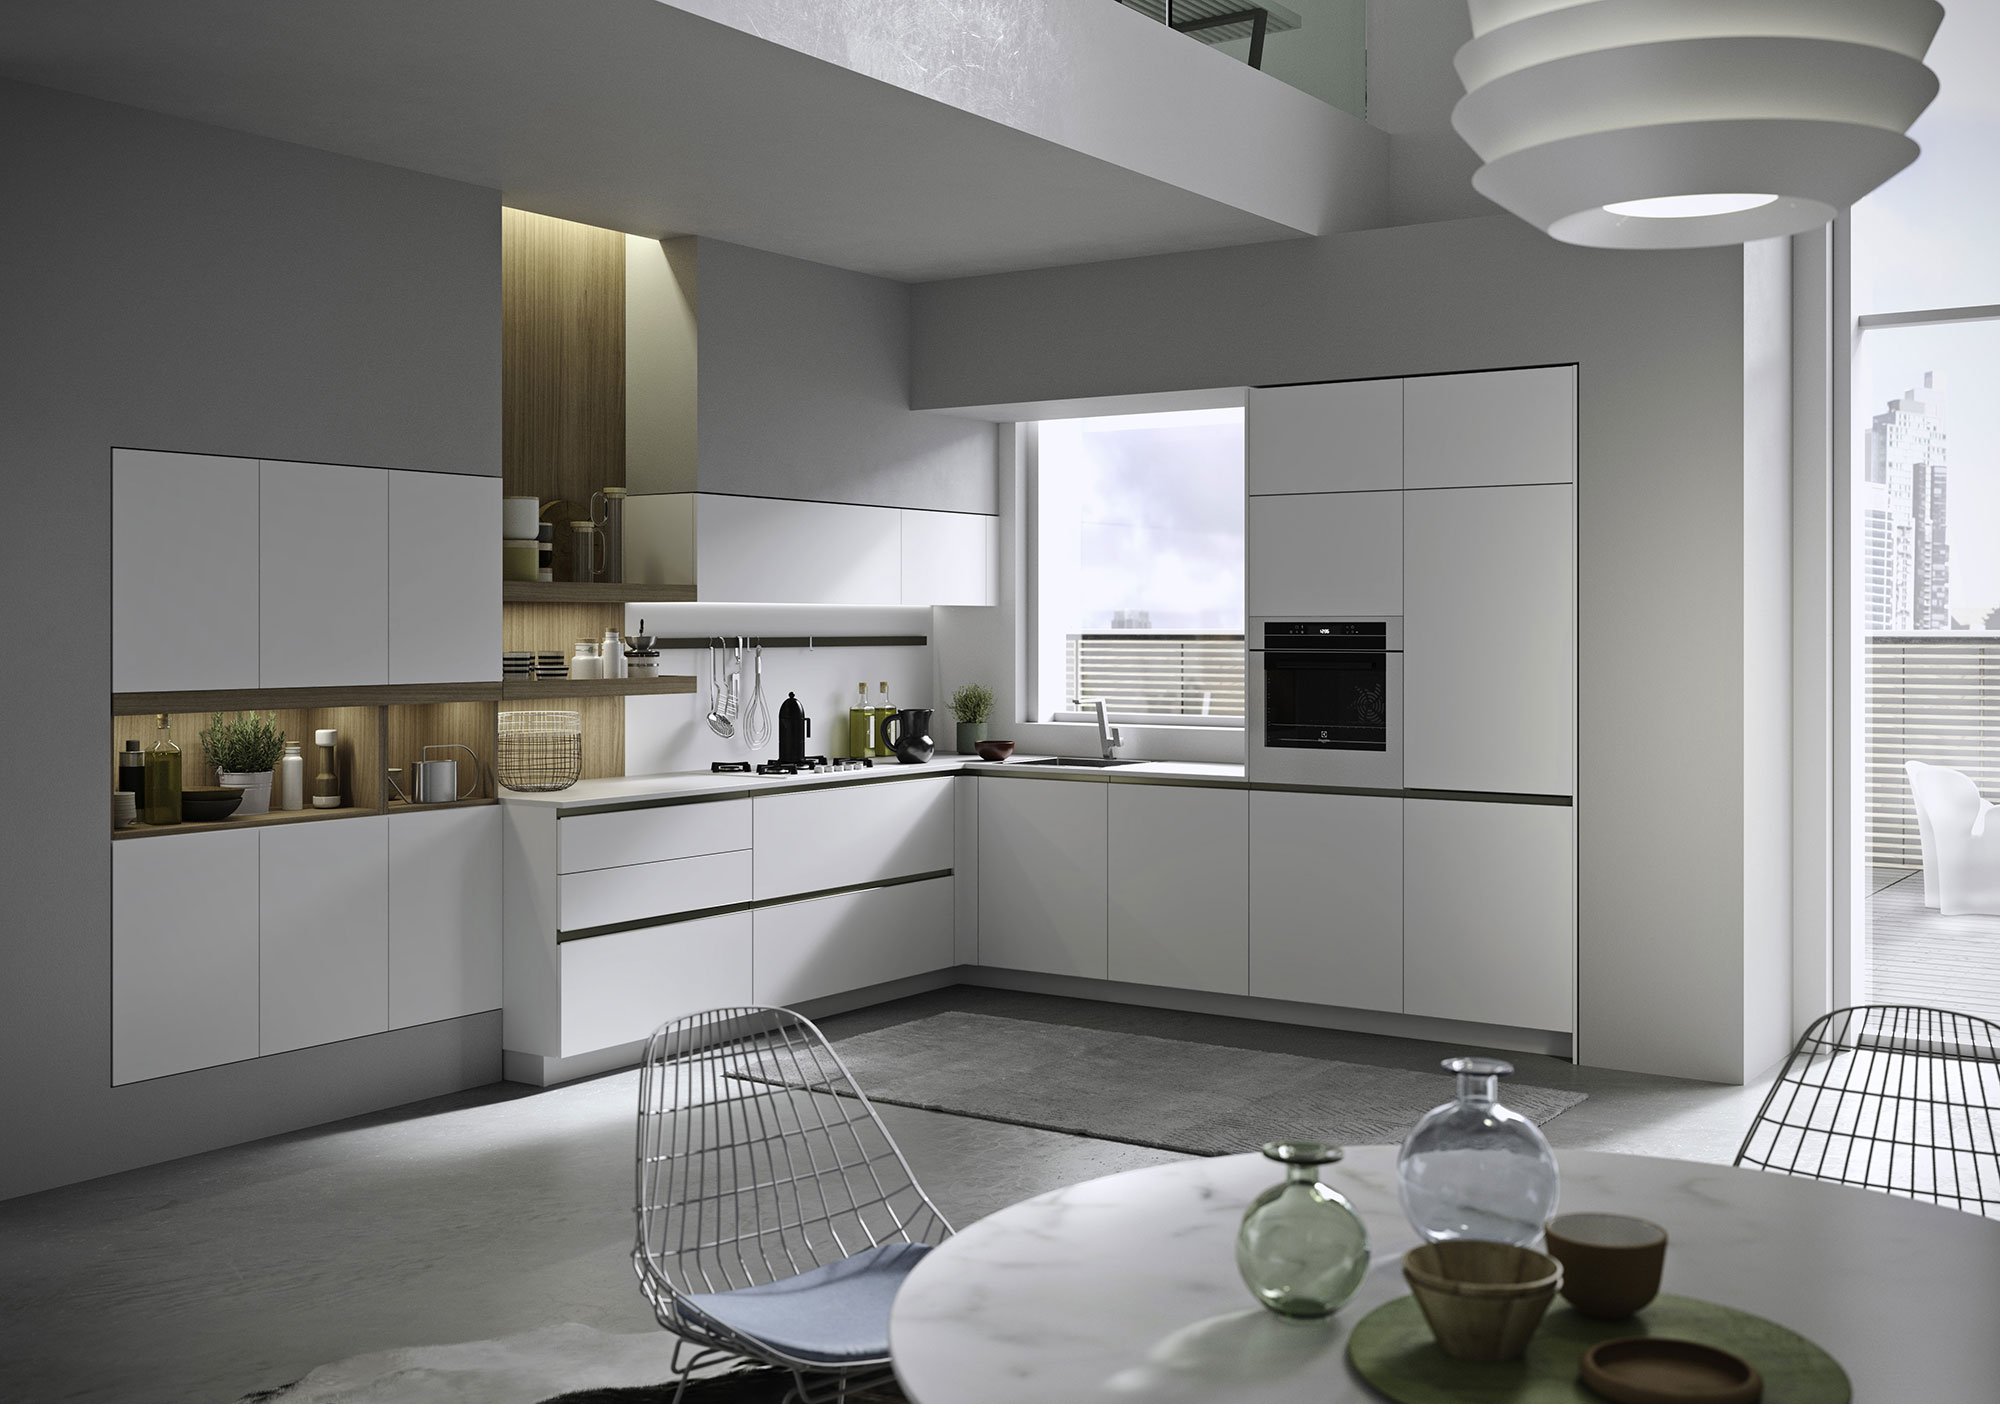 cucine-complete-joy-snaidero-dettaglio-4